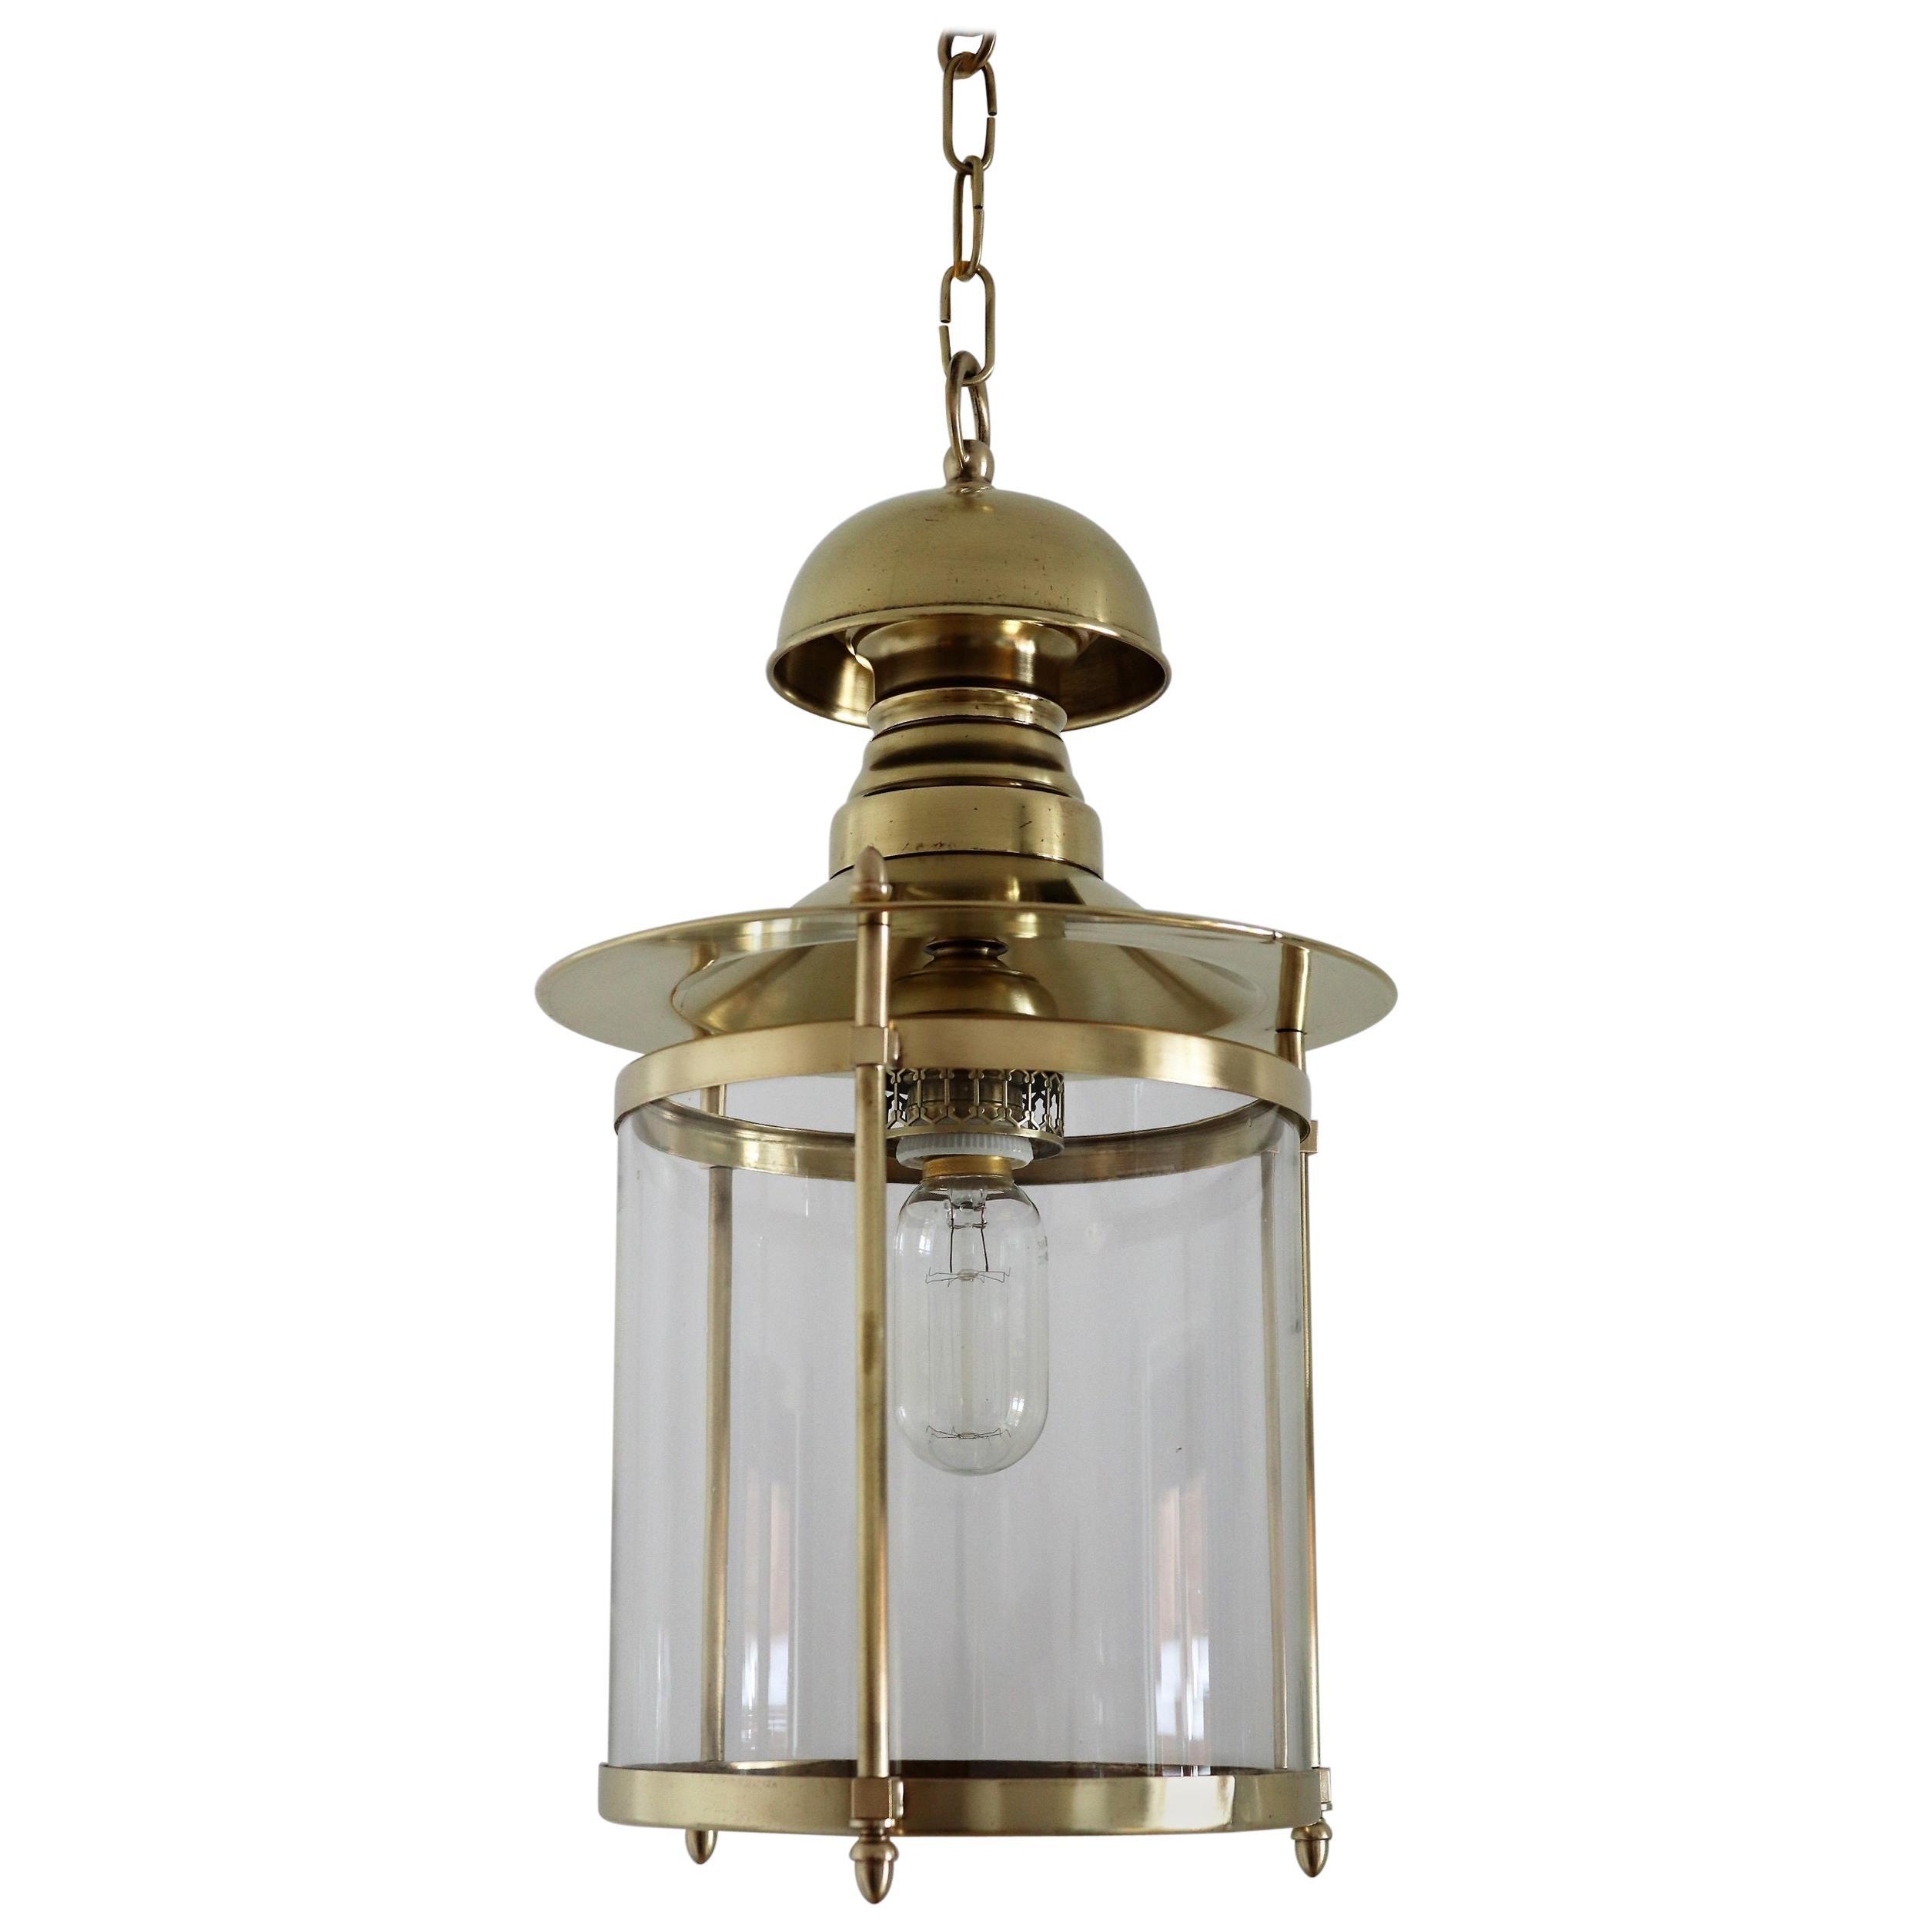 Italian Midcentury Brass and Glass Pendant Lamp or Lantern, 1970s